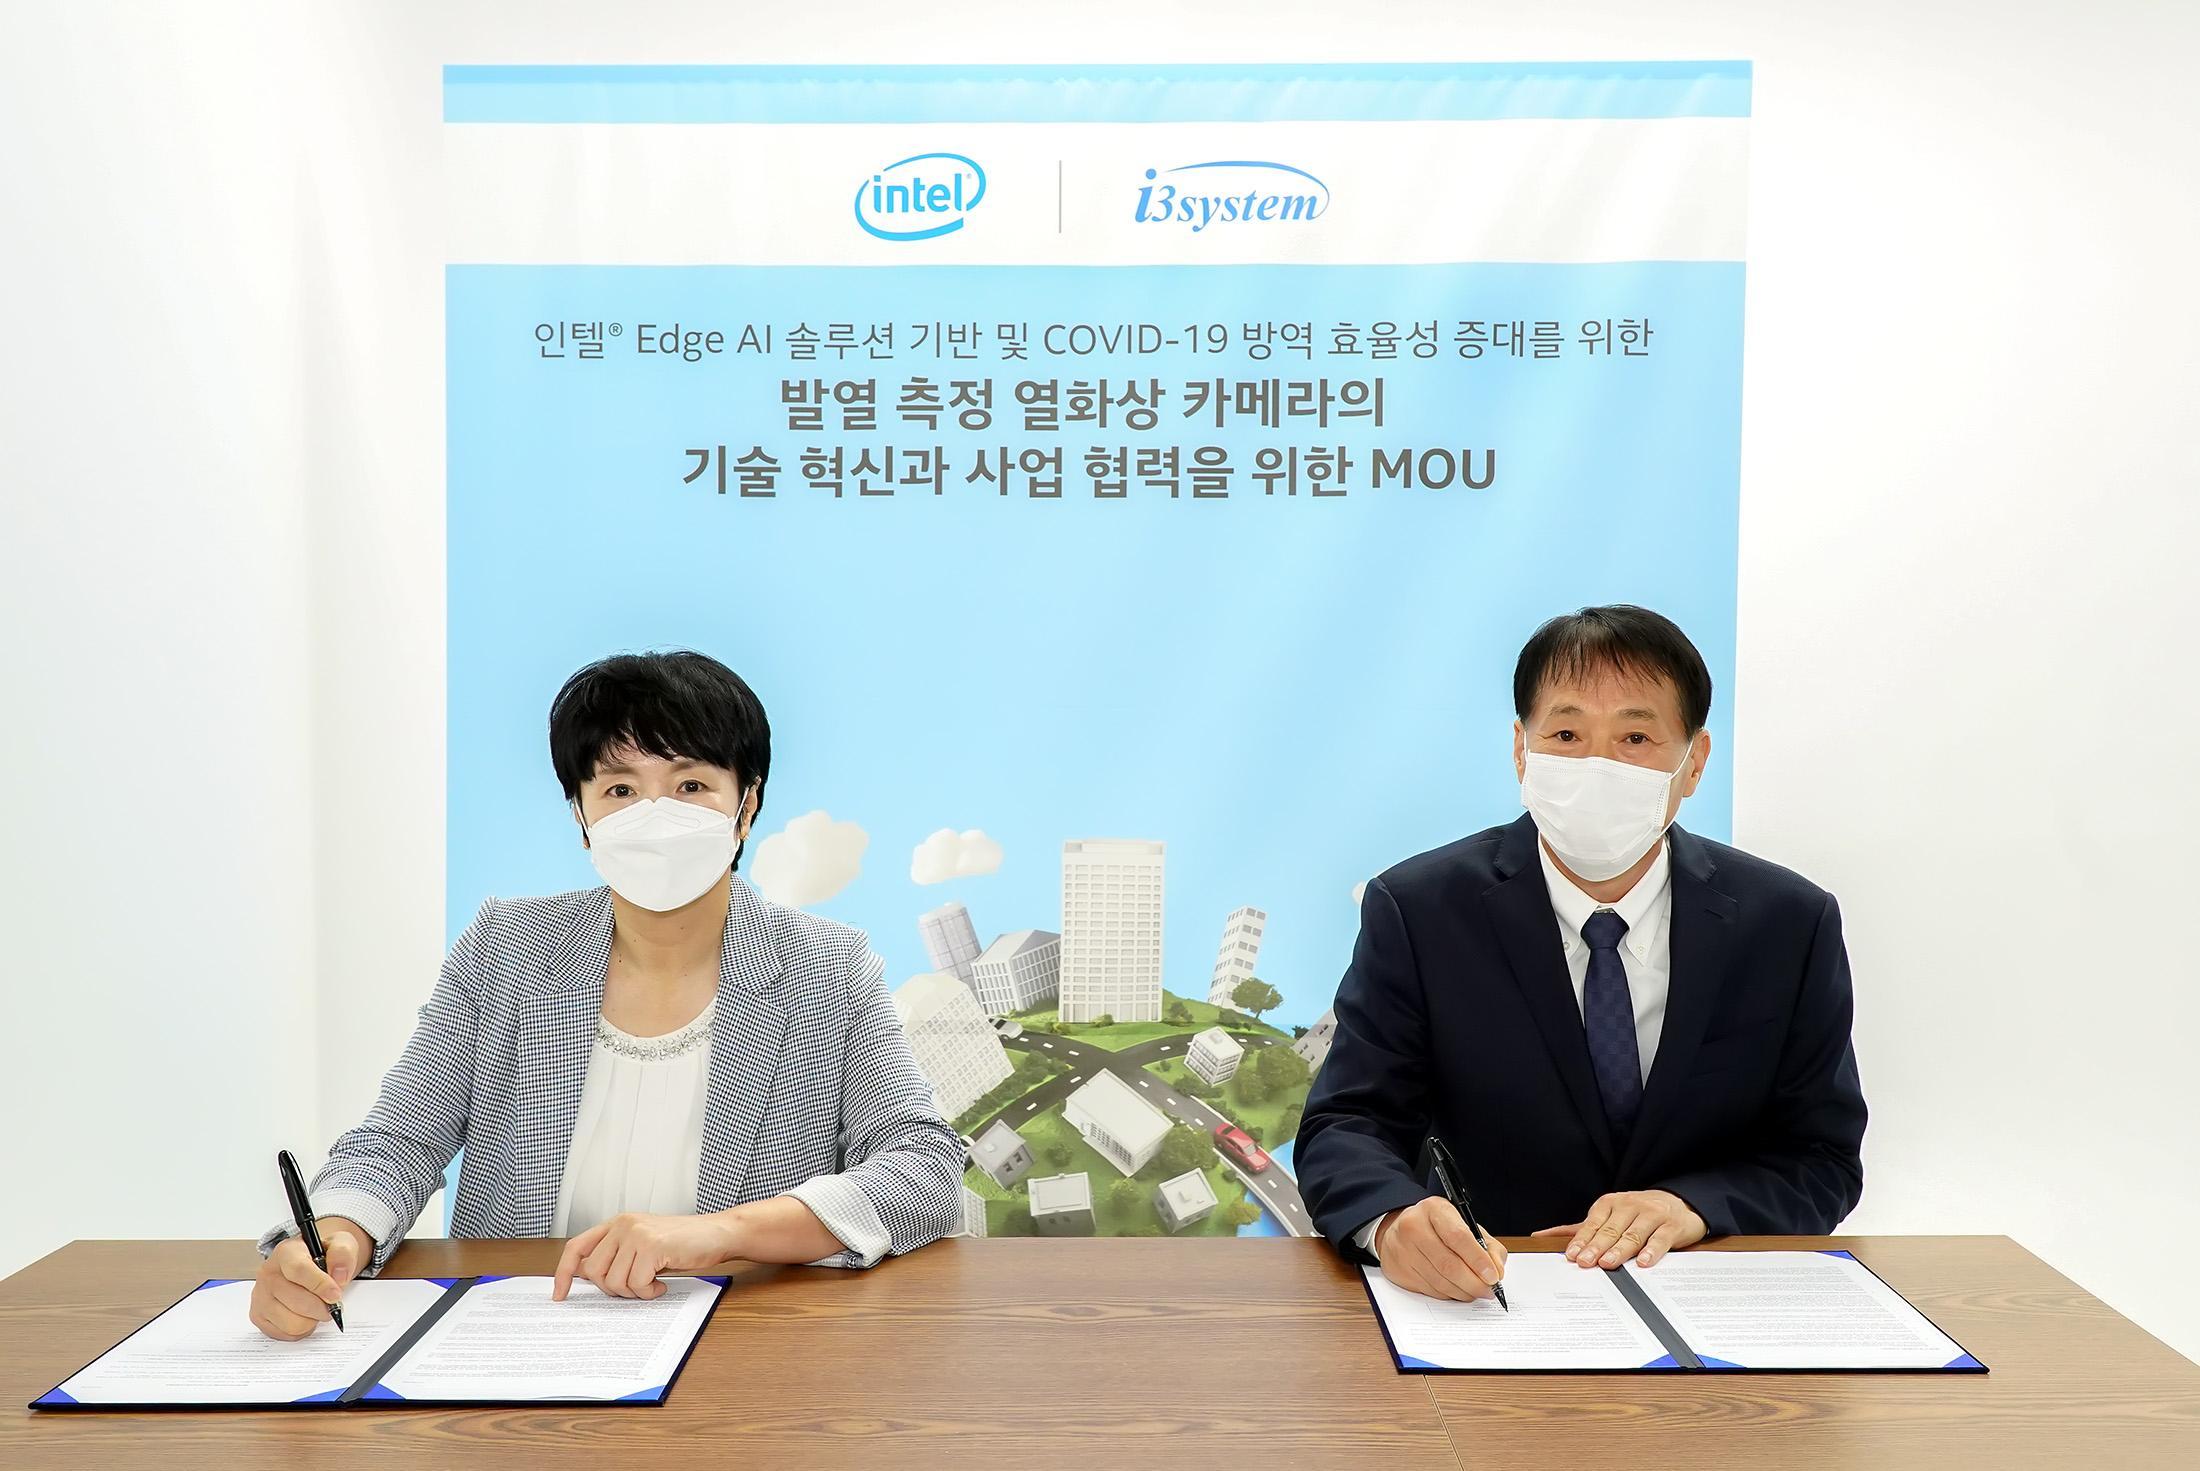 200729_Korea Edge AI Forum_Contents_7